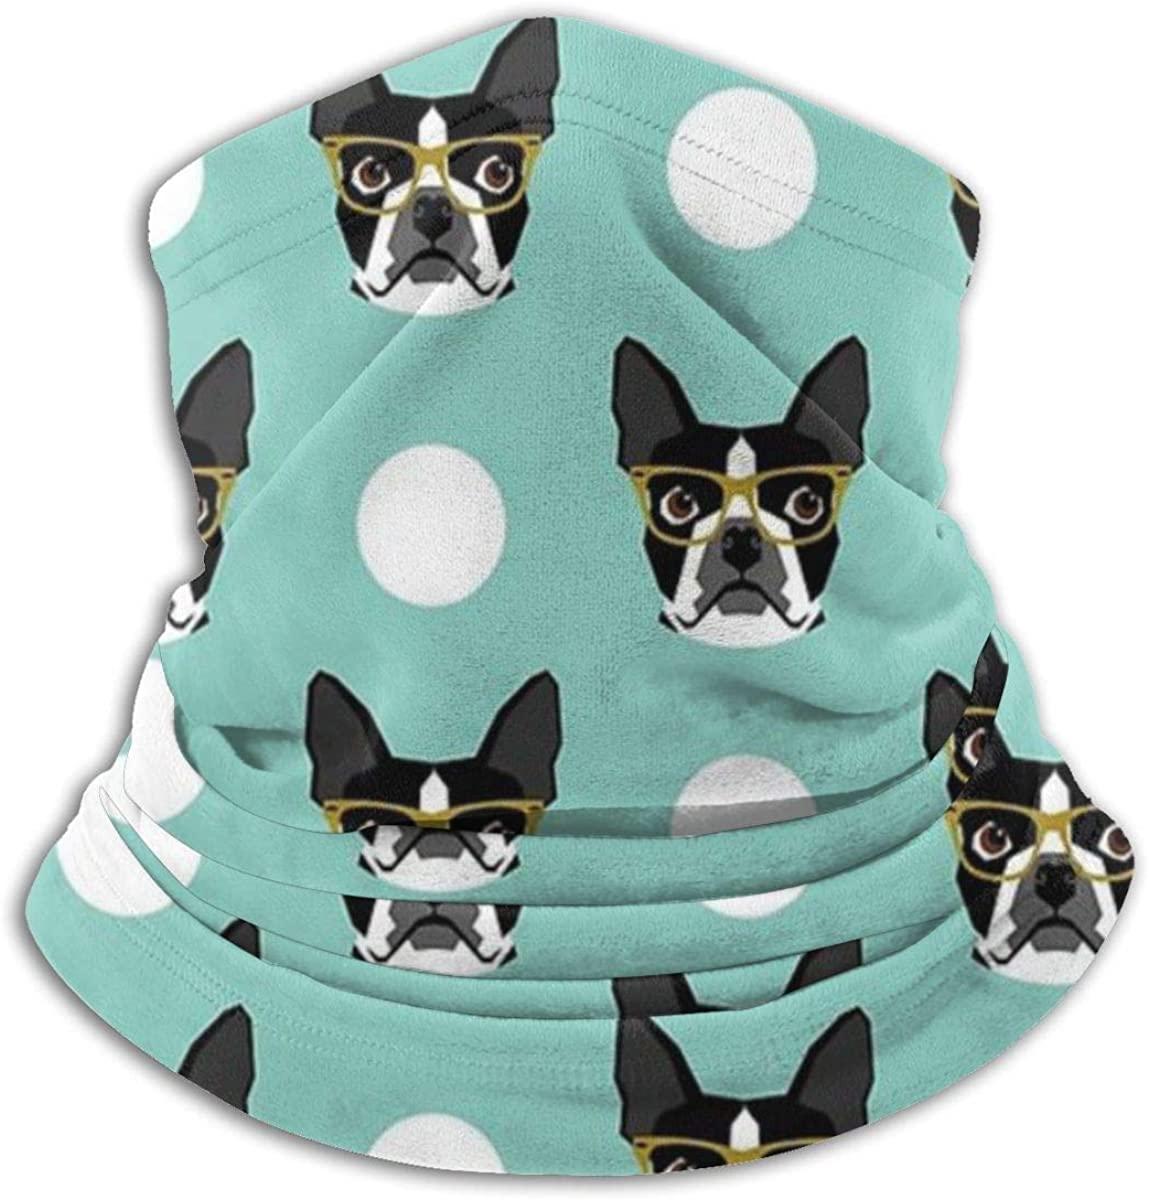 Boston Terrier Portable Storage Seamless Face Mask Bandanas for Dust Wind Neck Gaiter Magic Scarf, Outdoors, Festivals, Sports Black